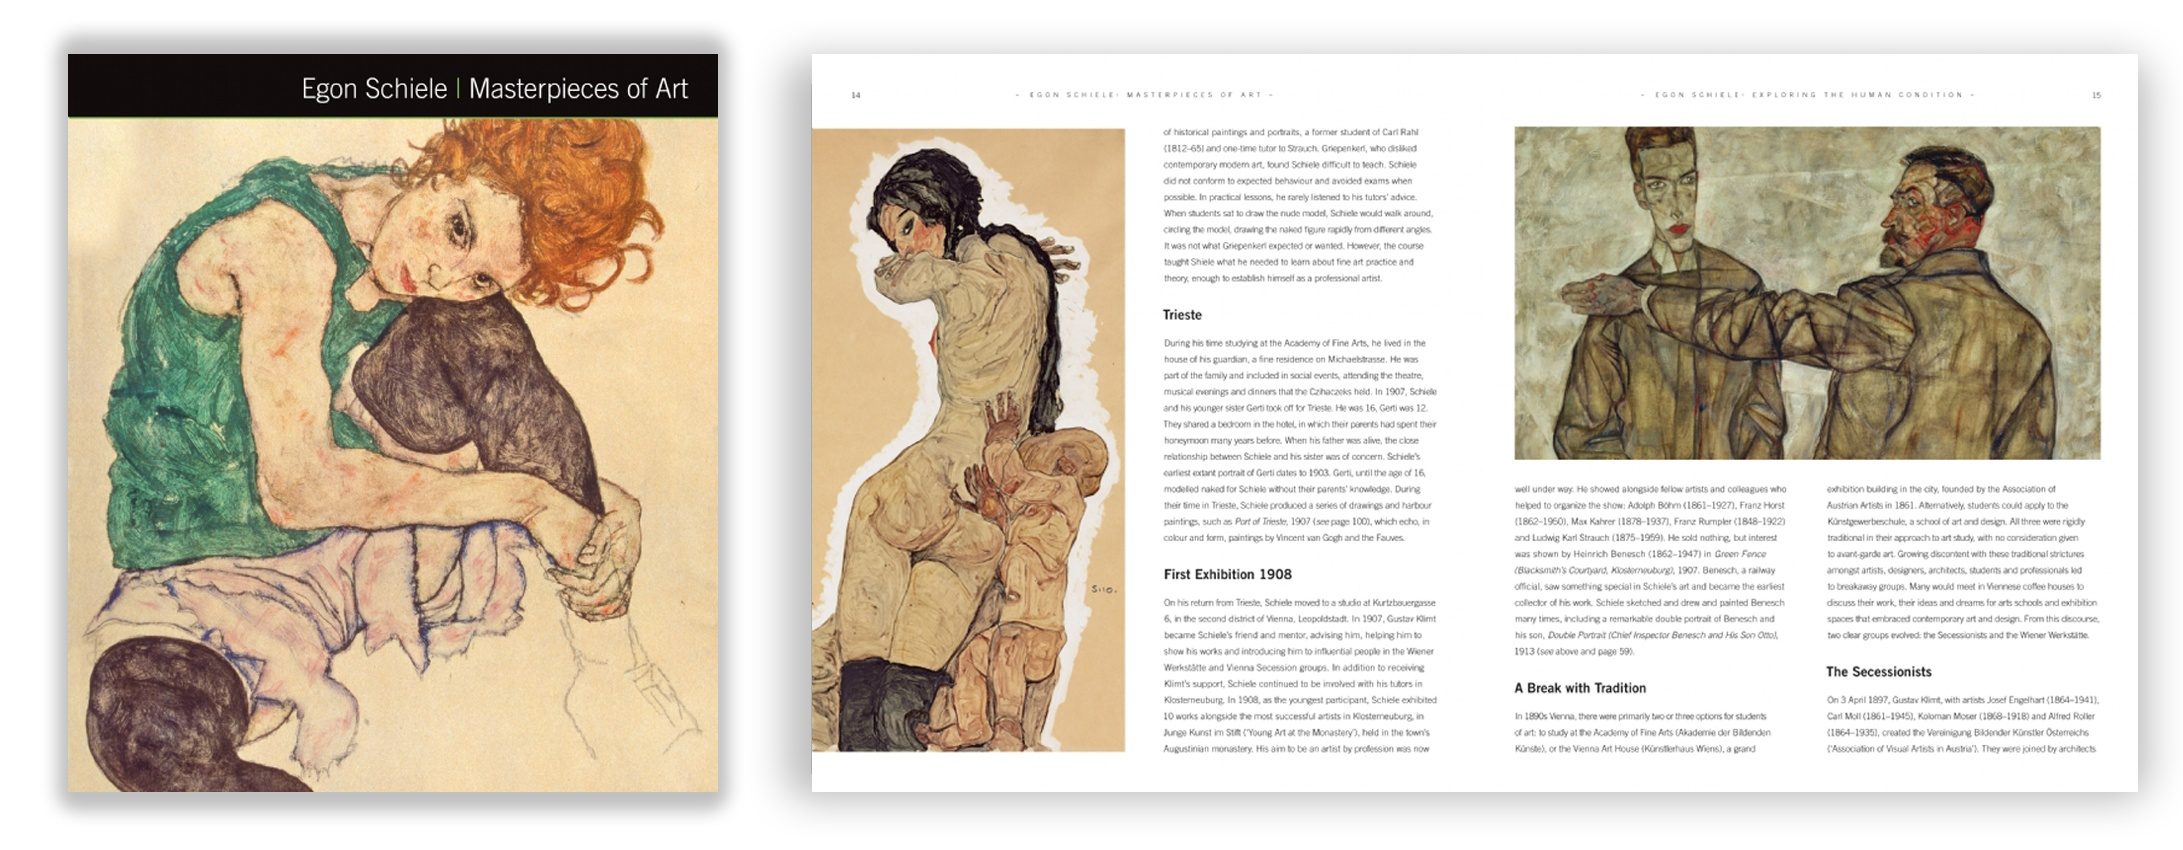 Schiele-masterpieces-art-spread